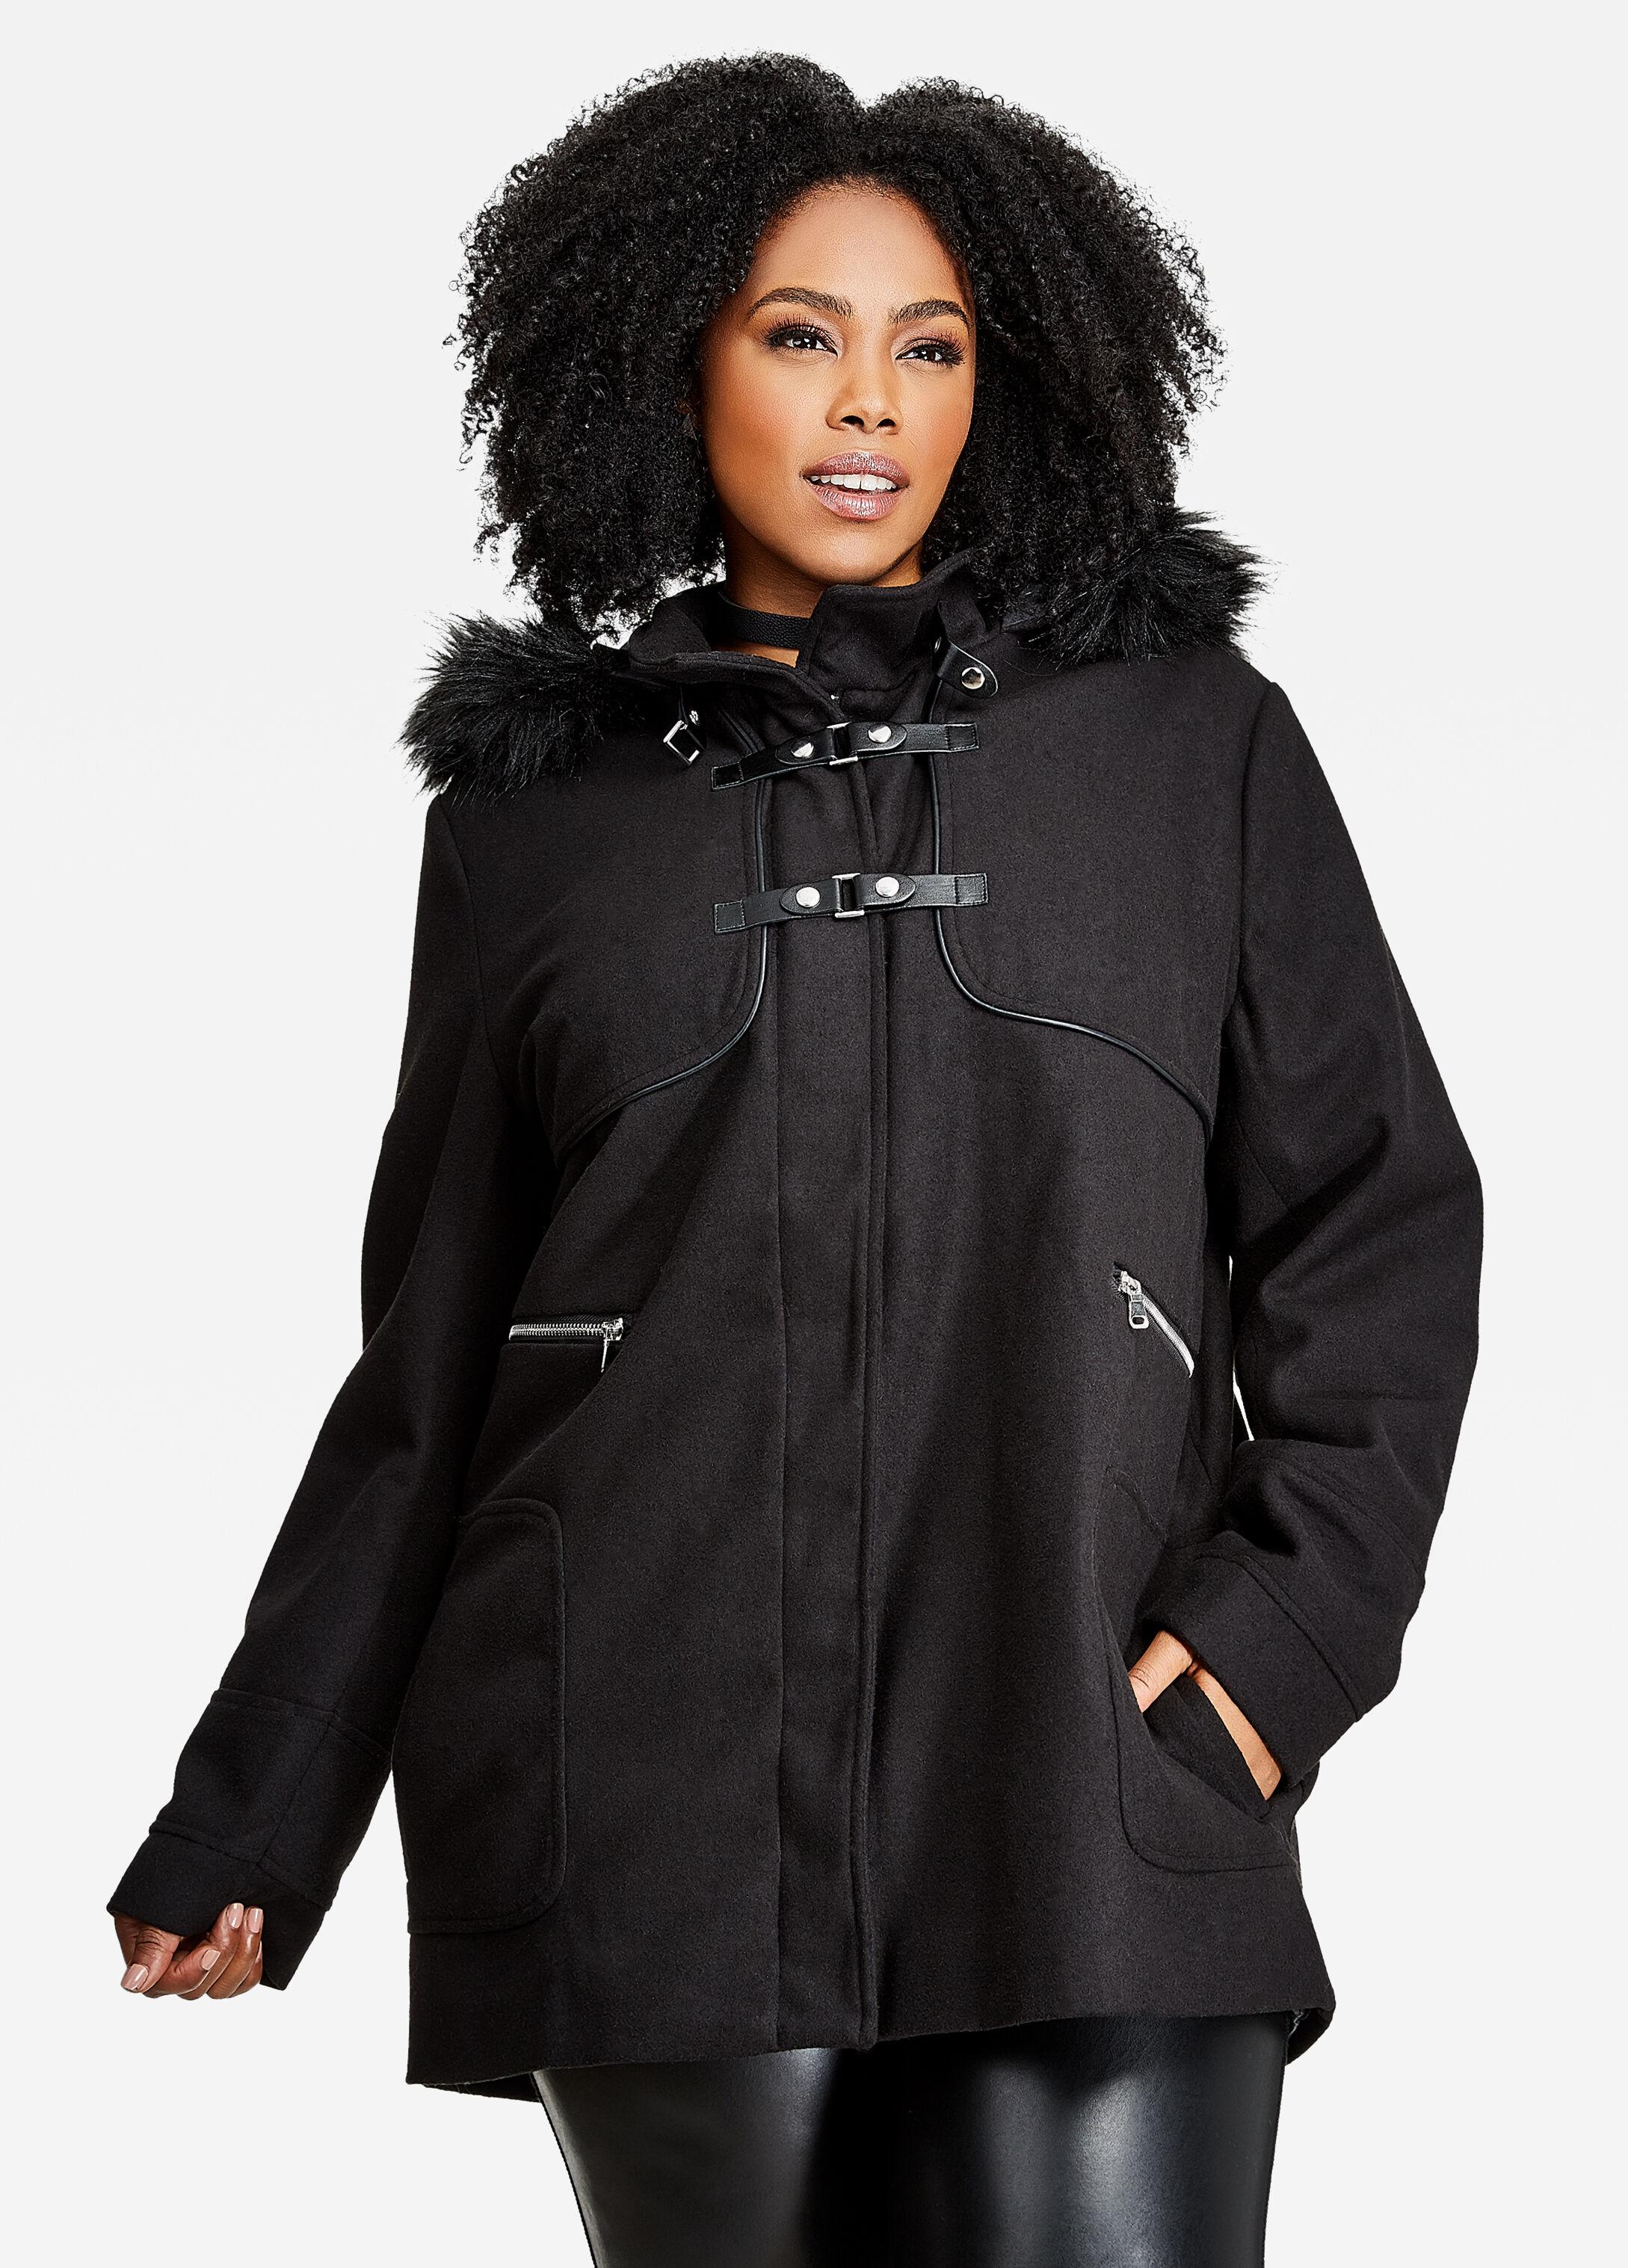 plus size winter coats for women | trendy coats & jackets | ashley